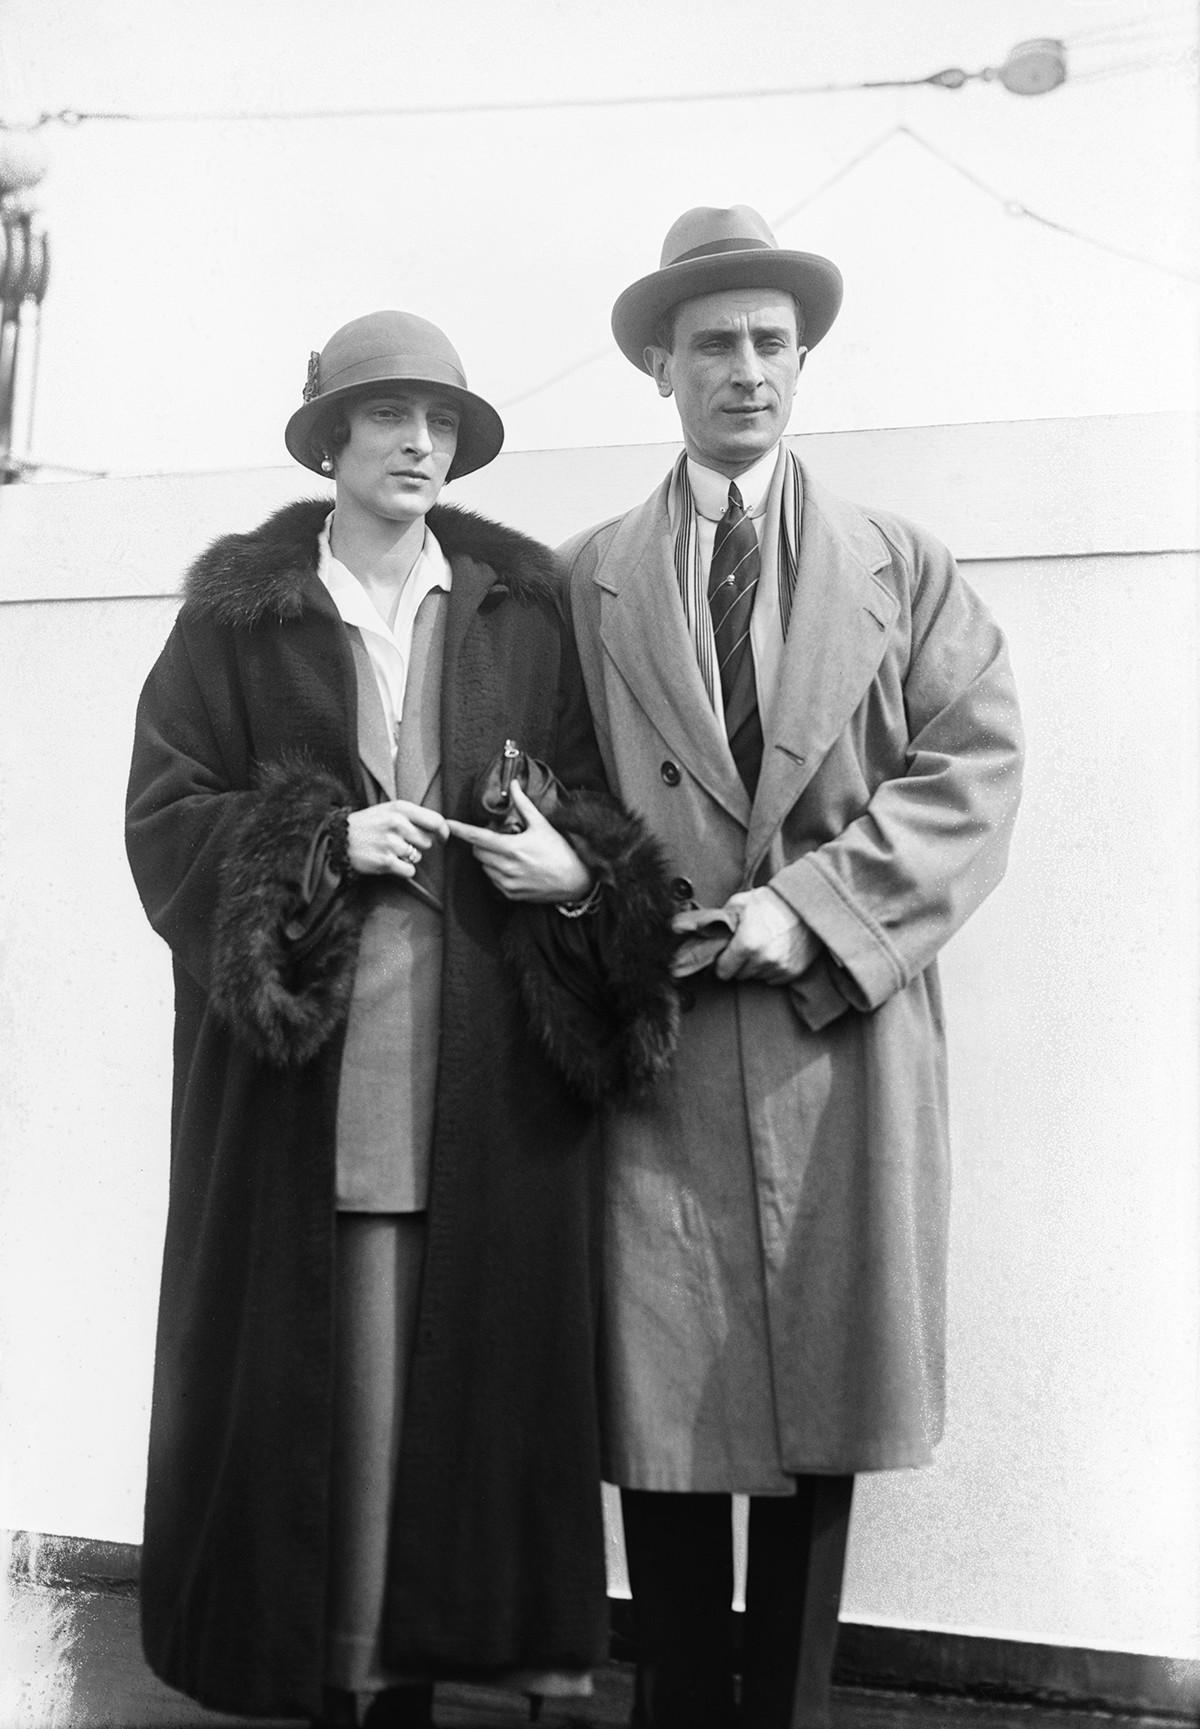 La principessa Irina e il principe Feliks Jusupov